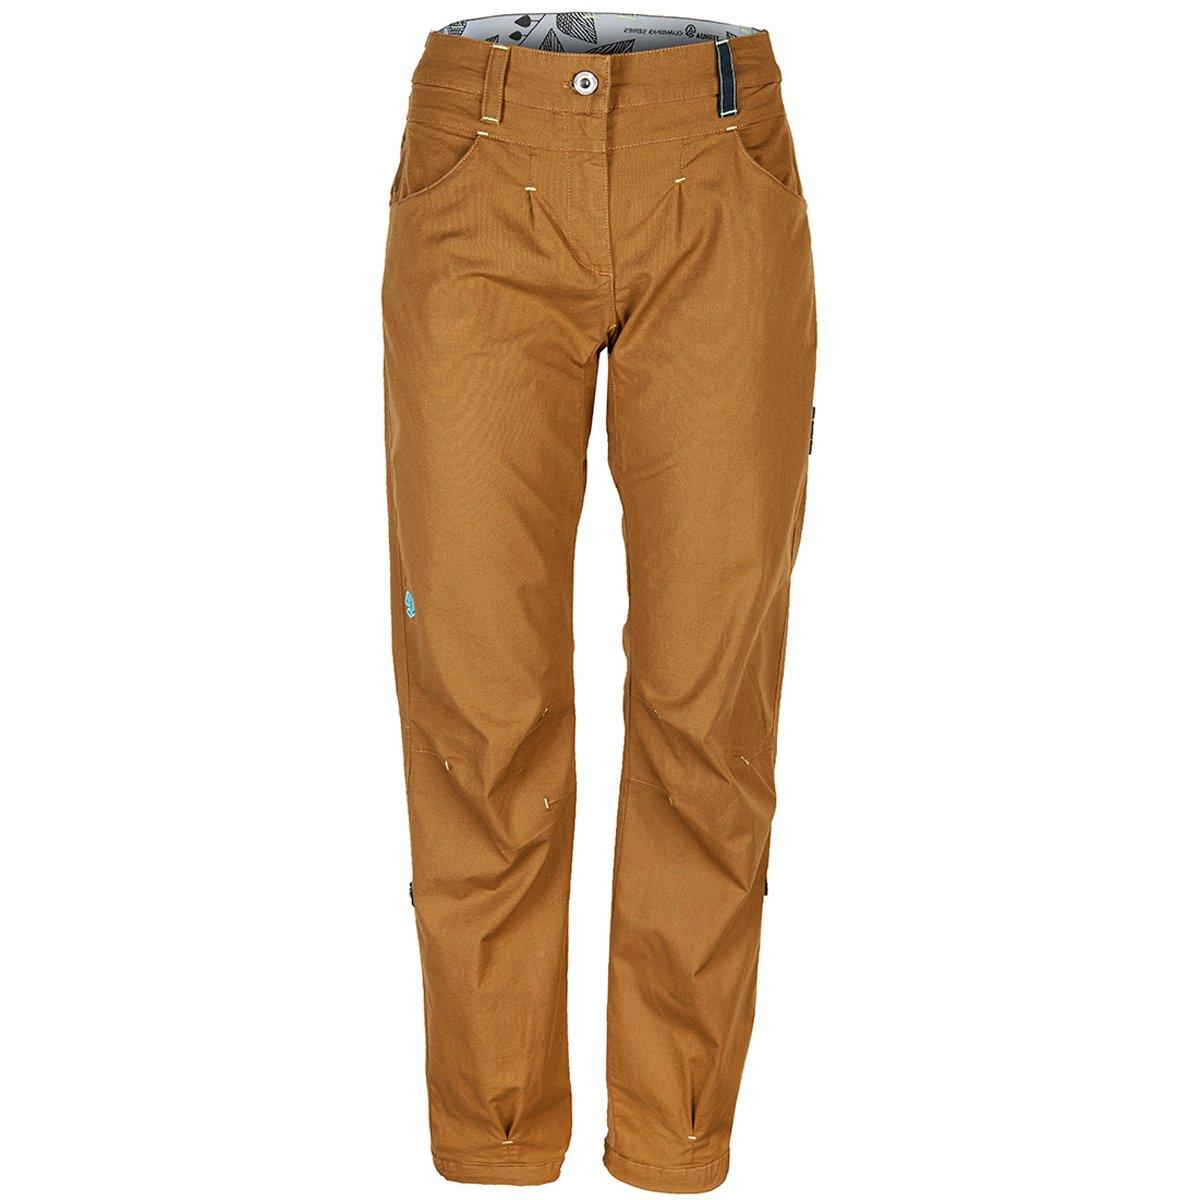 Pantalones de Algodón Orgánico para mujer - 100% algodón ...